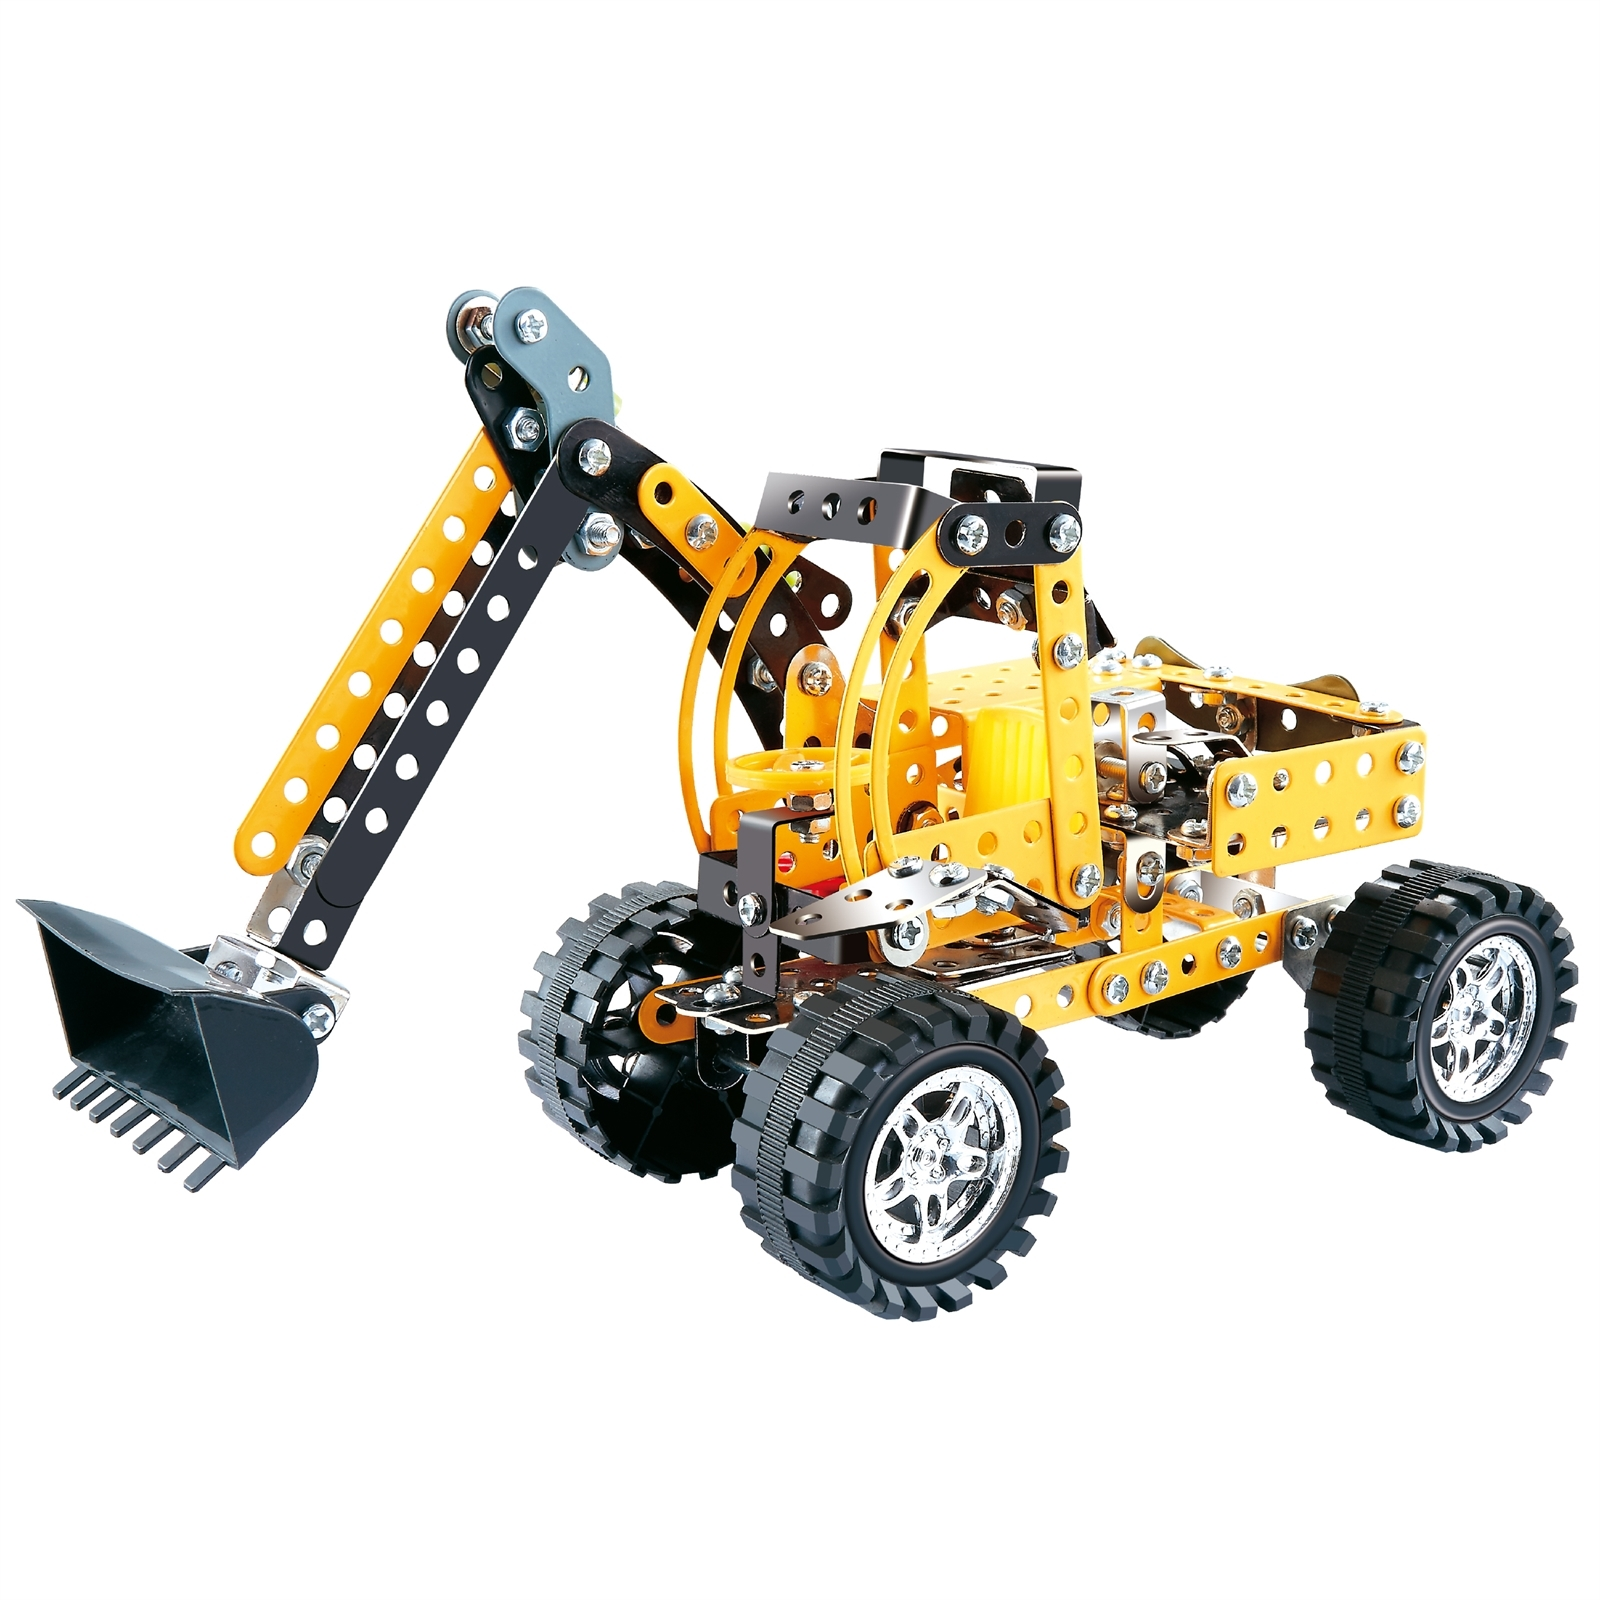 Boyle S.T.E.A.M. Excavator Metal Craft Construction Kit